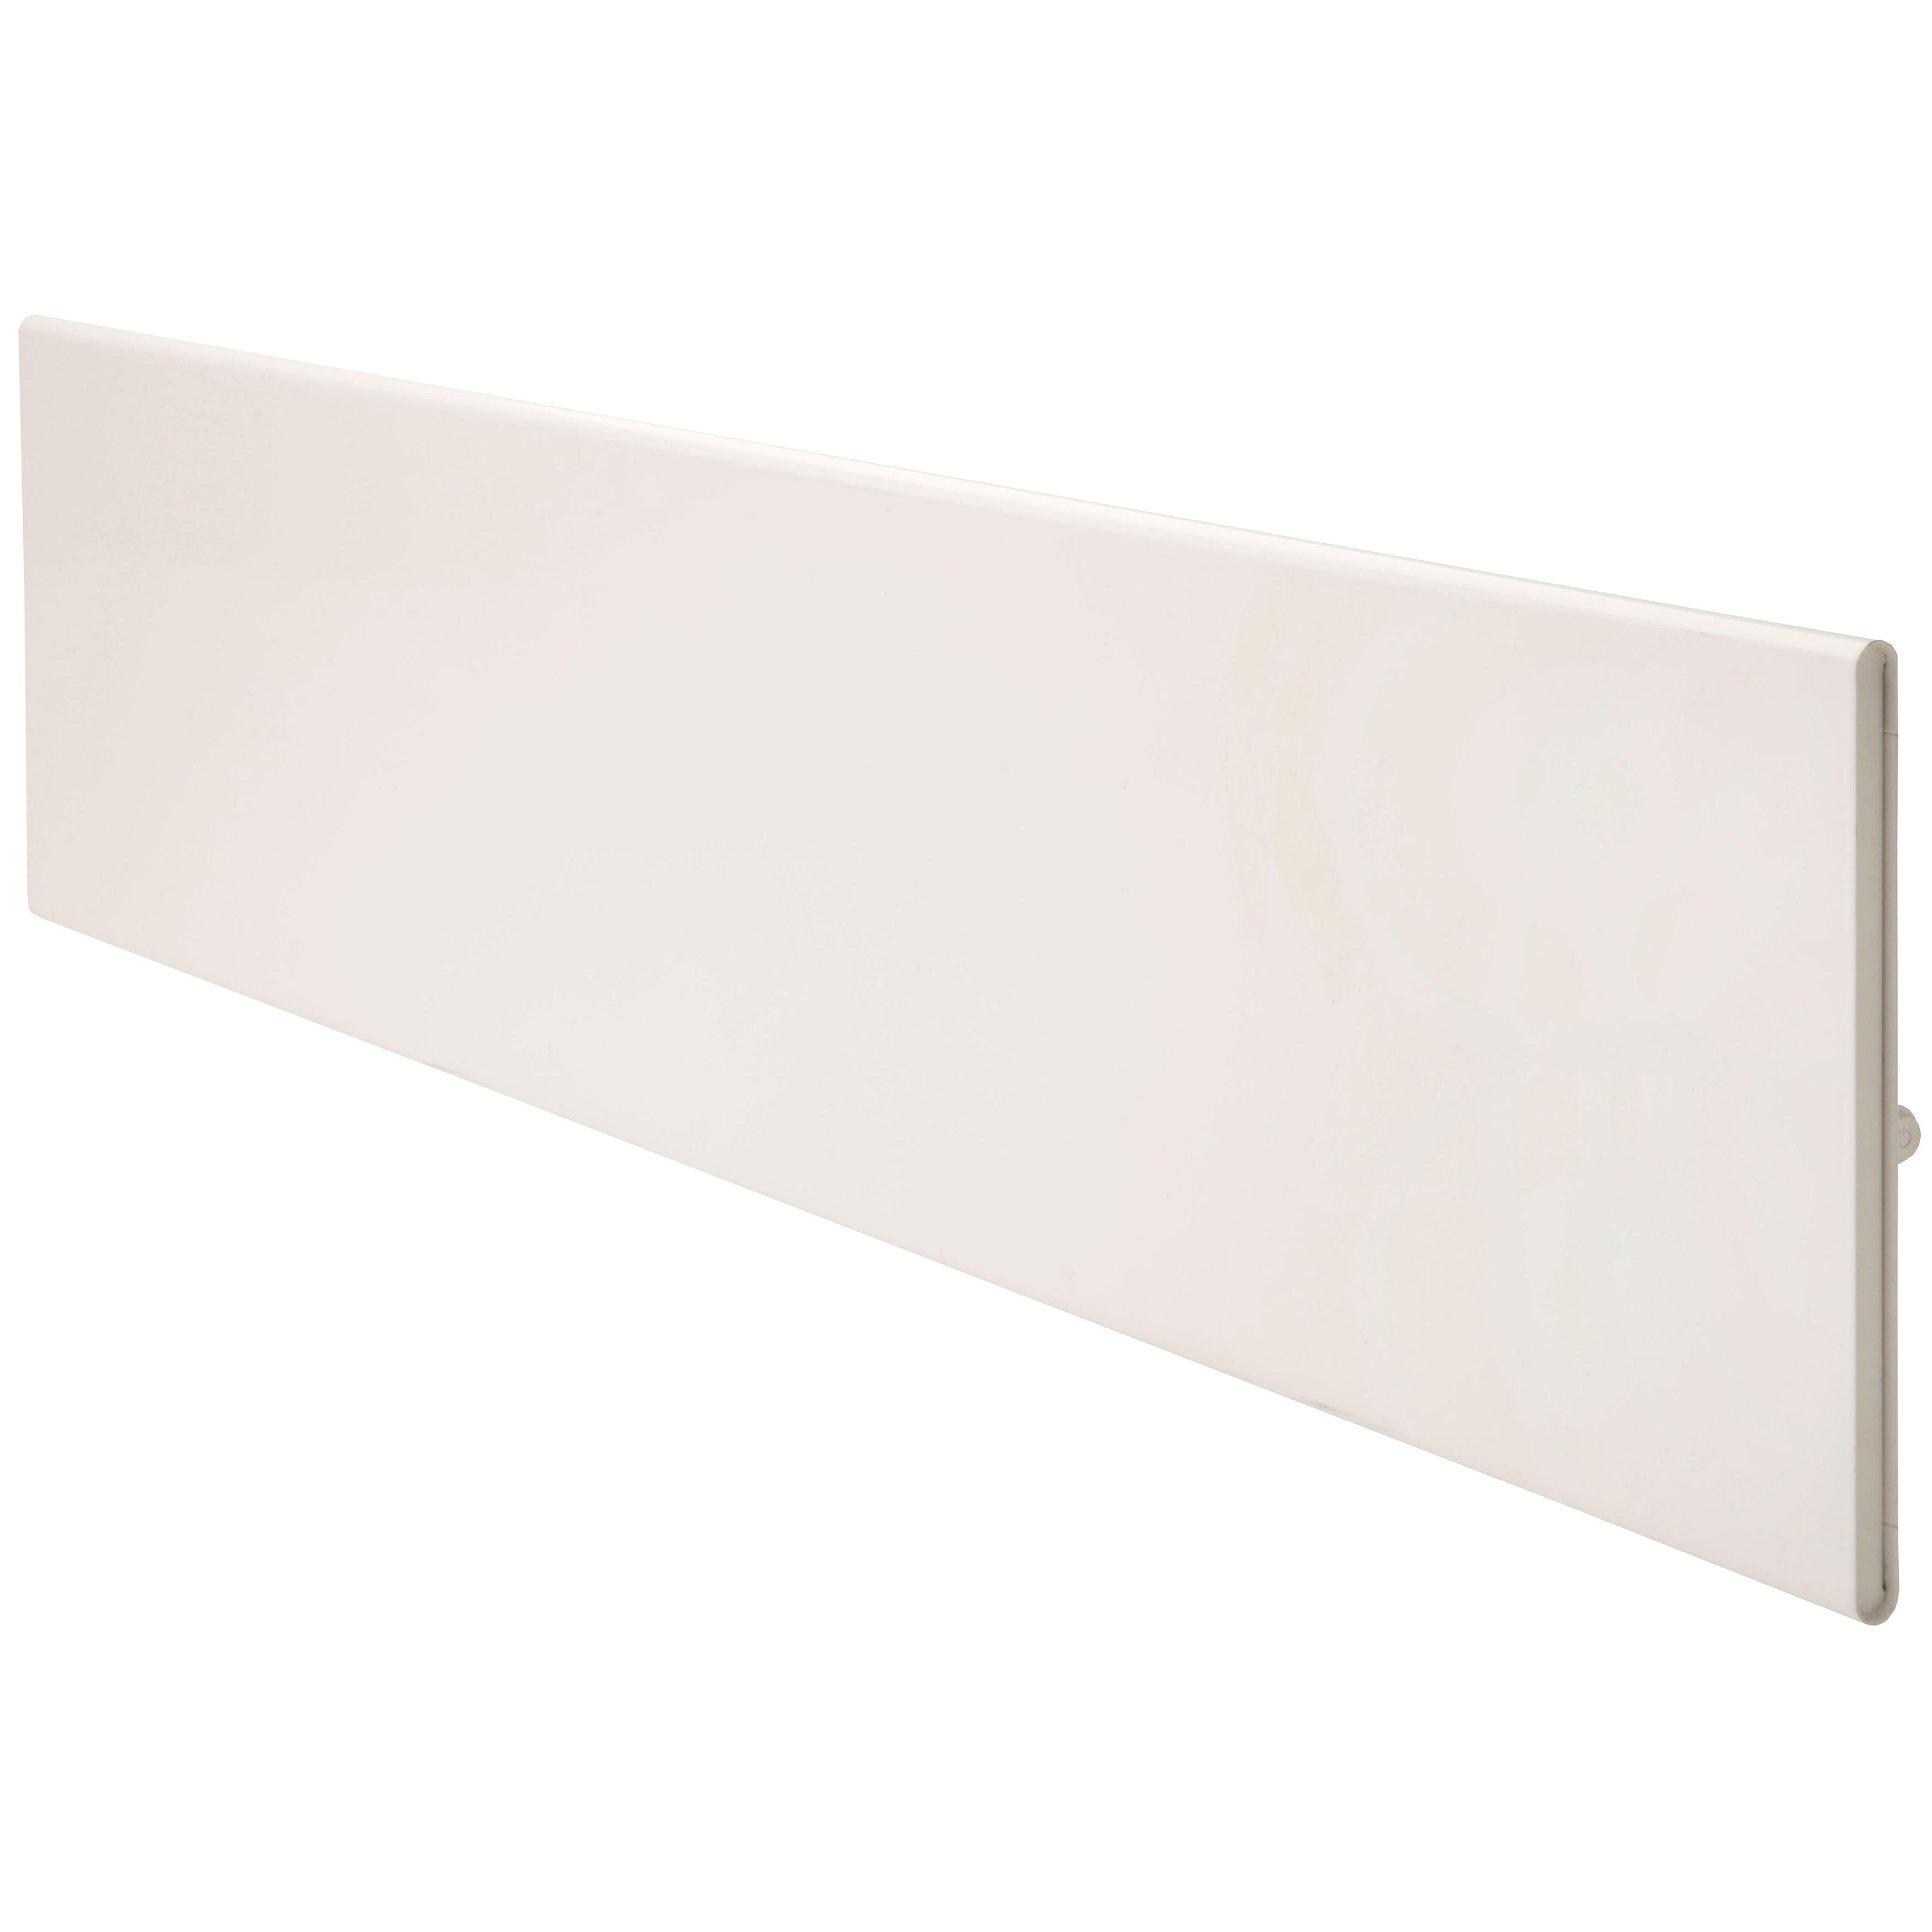 420046 : Adax Neo panelovn NL1400WIFI